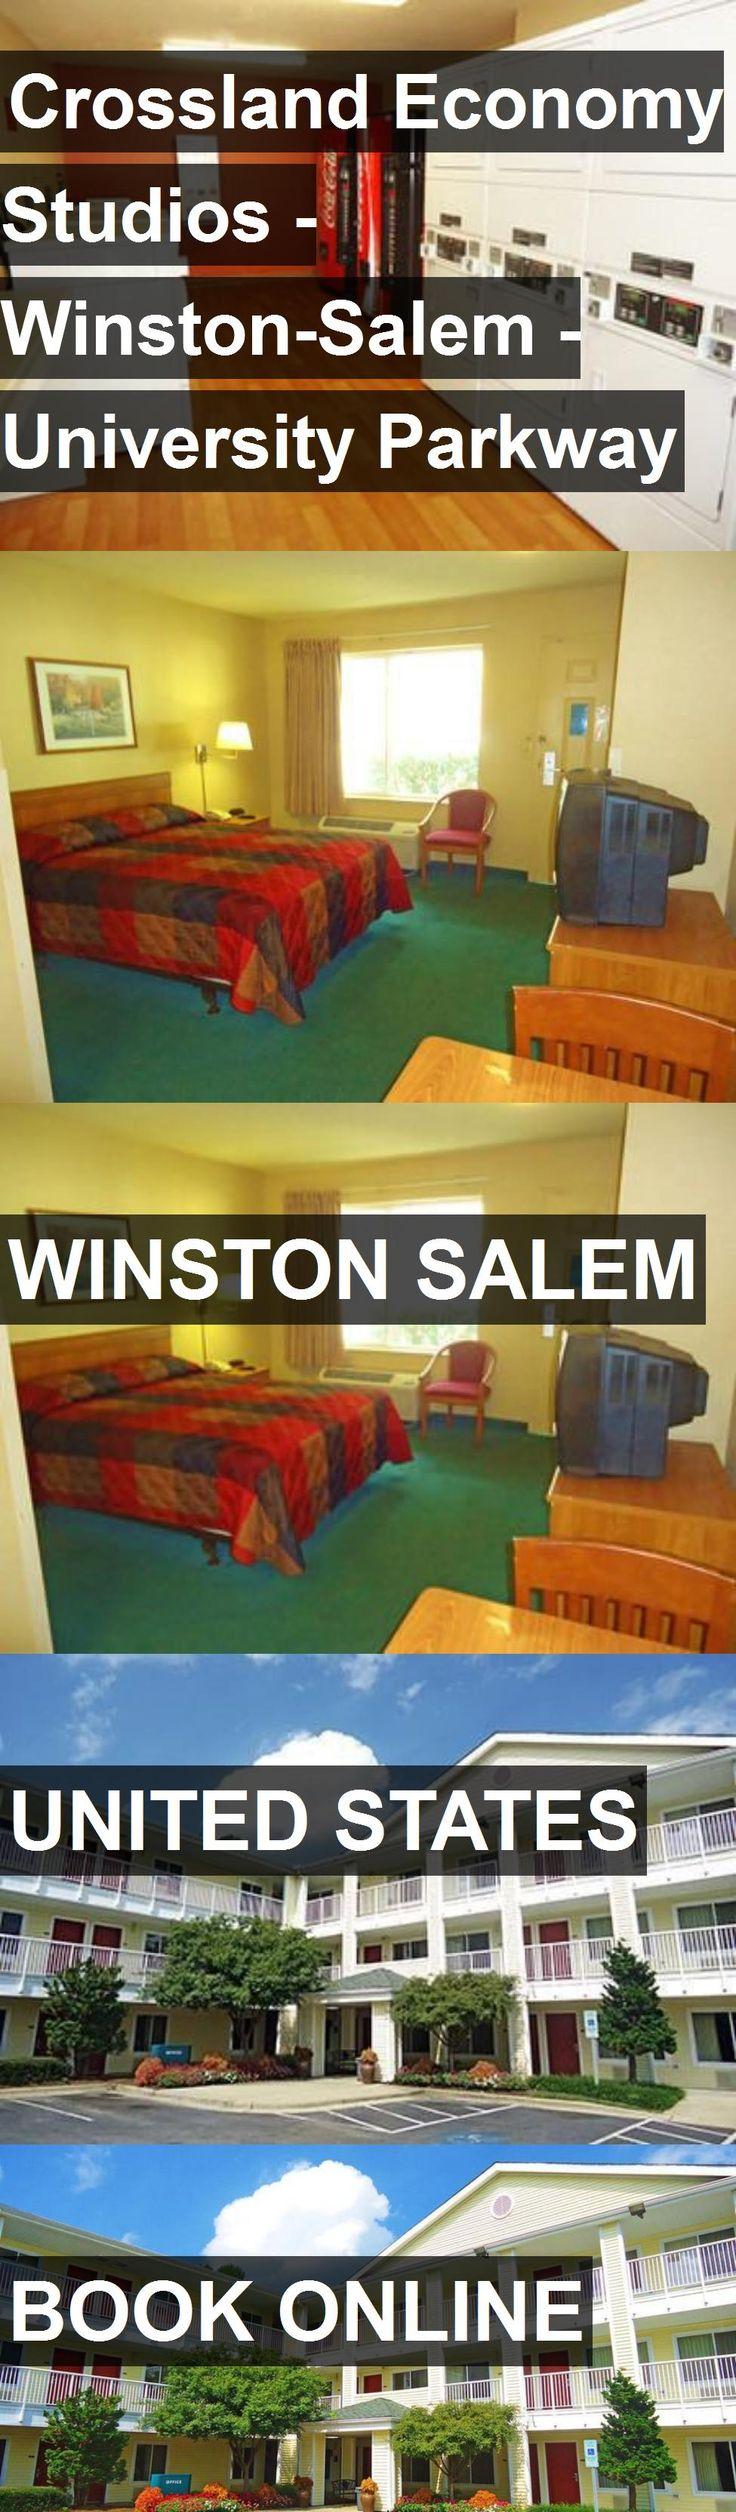 Hotel Crossland Economy Studios - Winston-Salem - University Parkway in Winston Salem, United States. For more information, photos, reviews and best prices please follow the link. #UnitedStates #WinstonSalem #travel #vacation #hotel